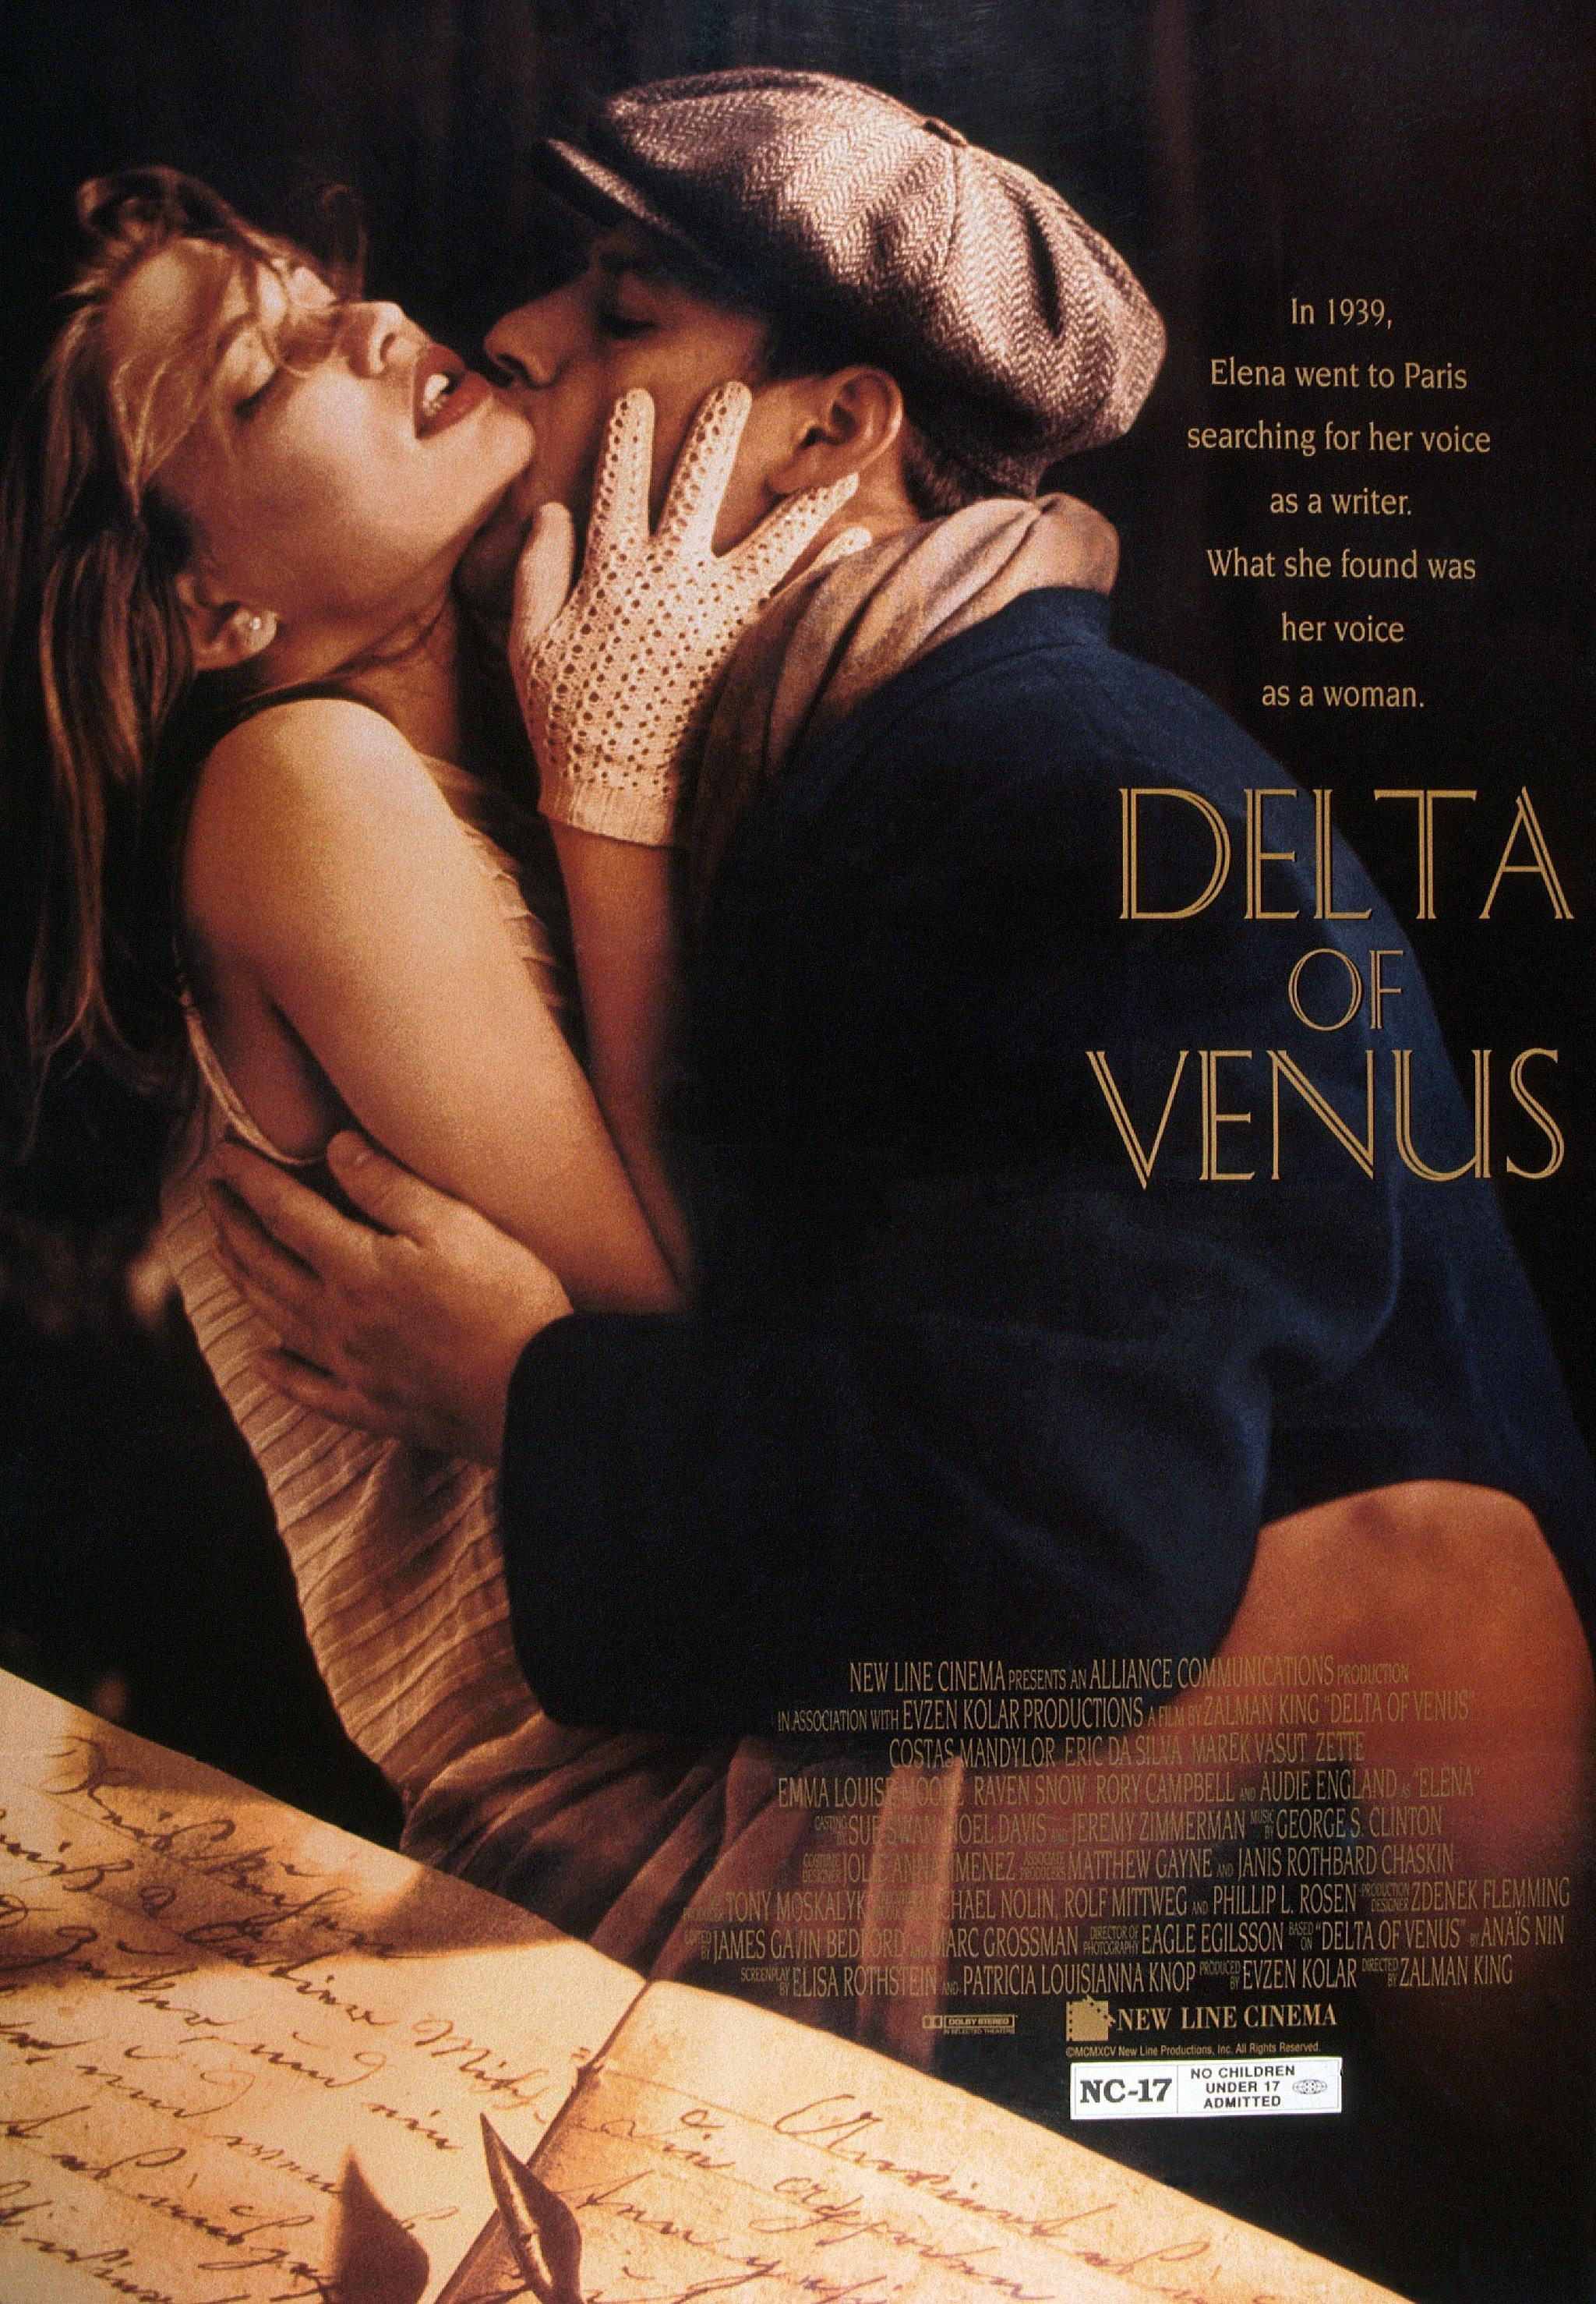 Venüs Deltası